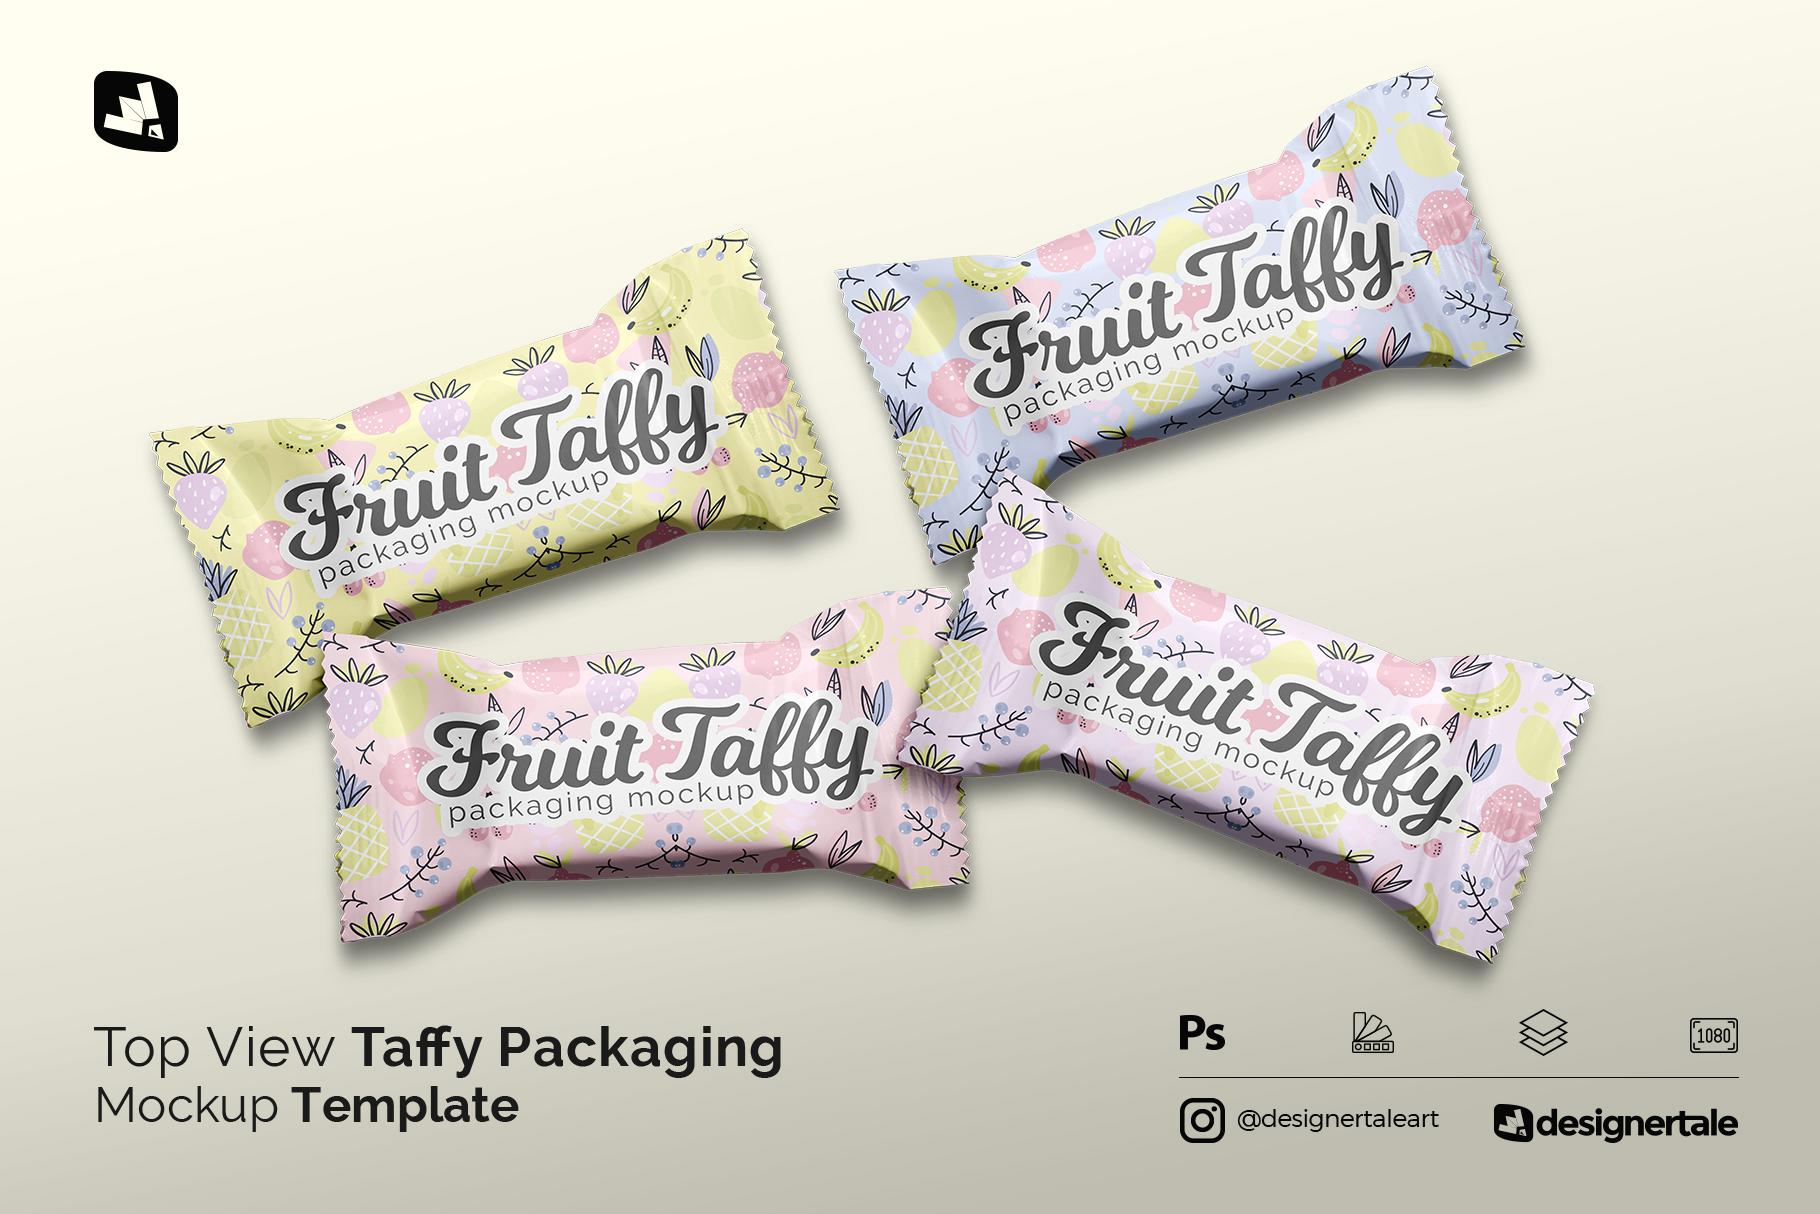 top view taffy packaging mockup